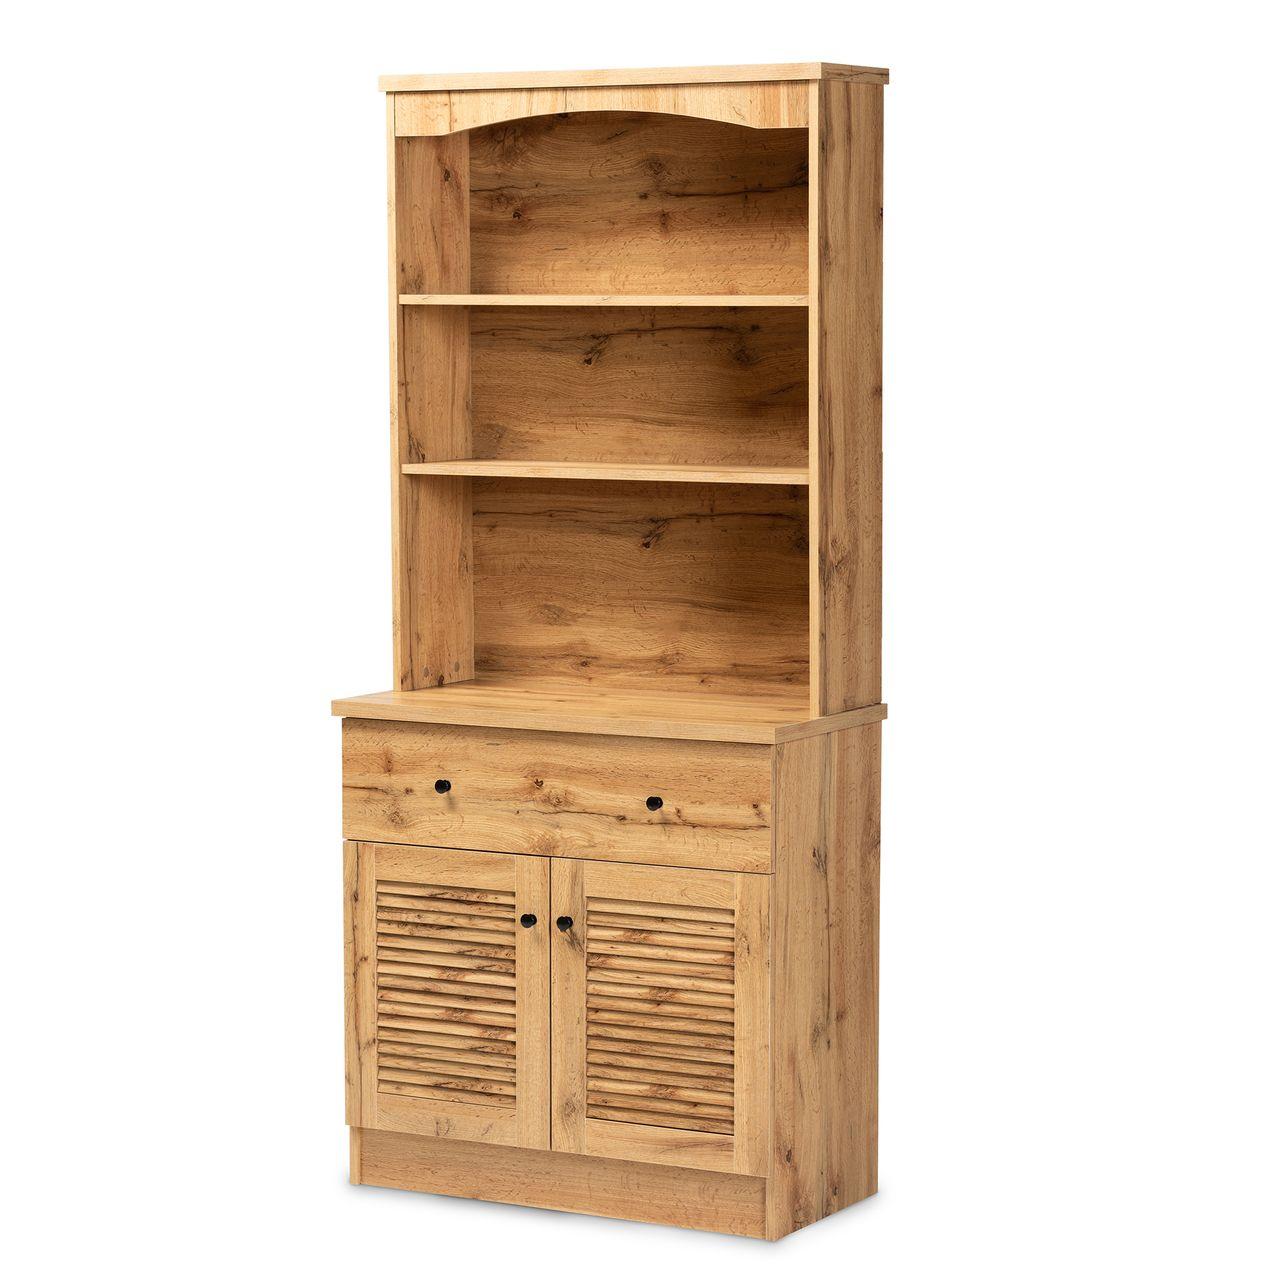 Baxton Studio Agni Buffet and Hutch Kitchen Cabinet - Oak Brown